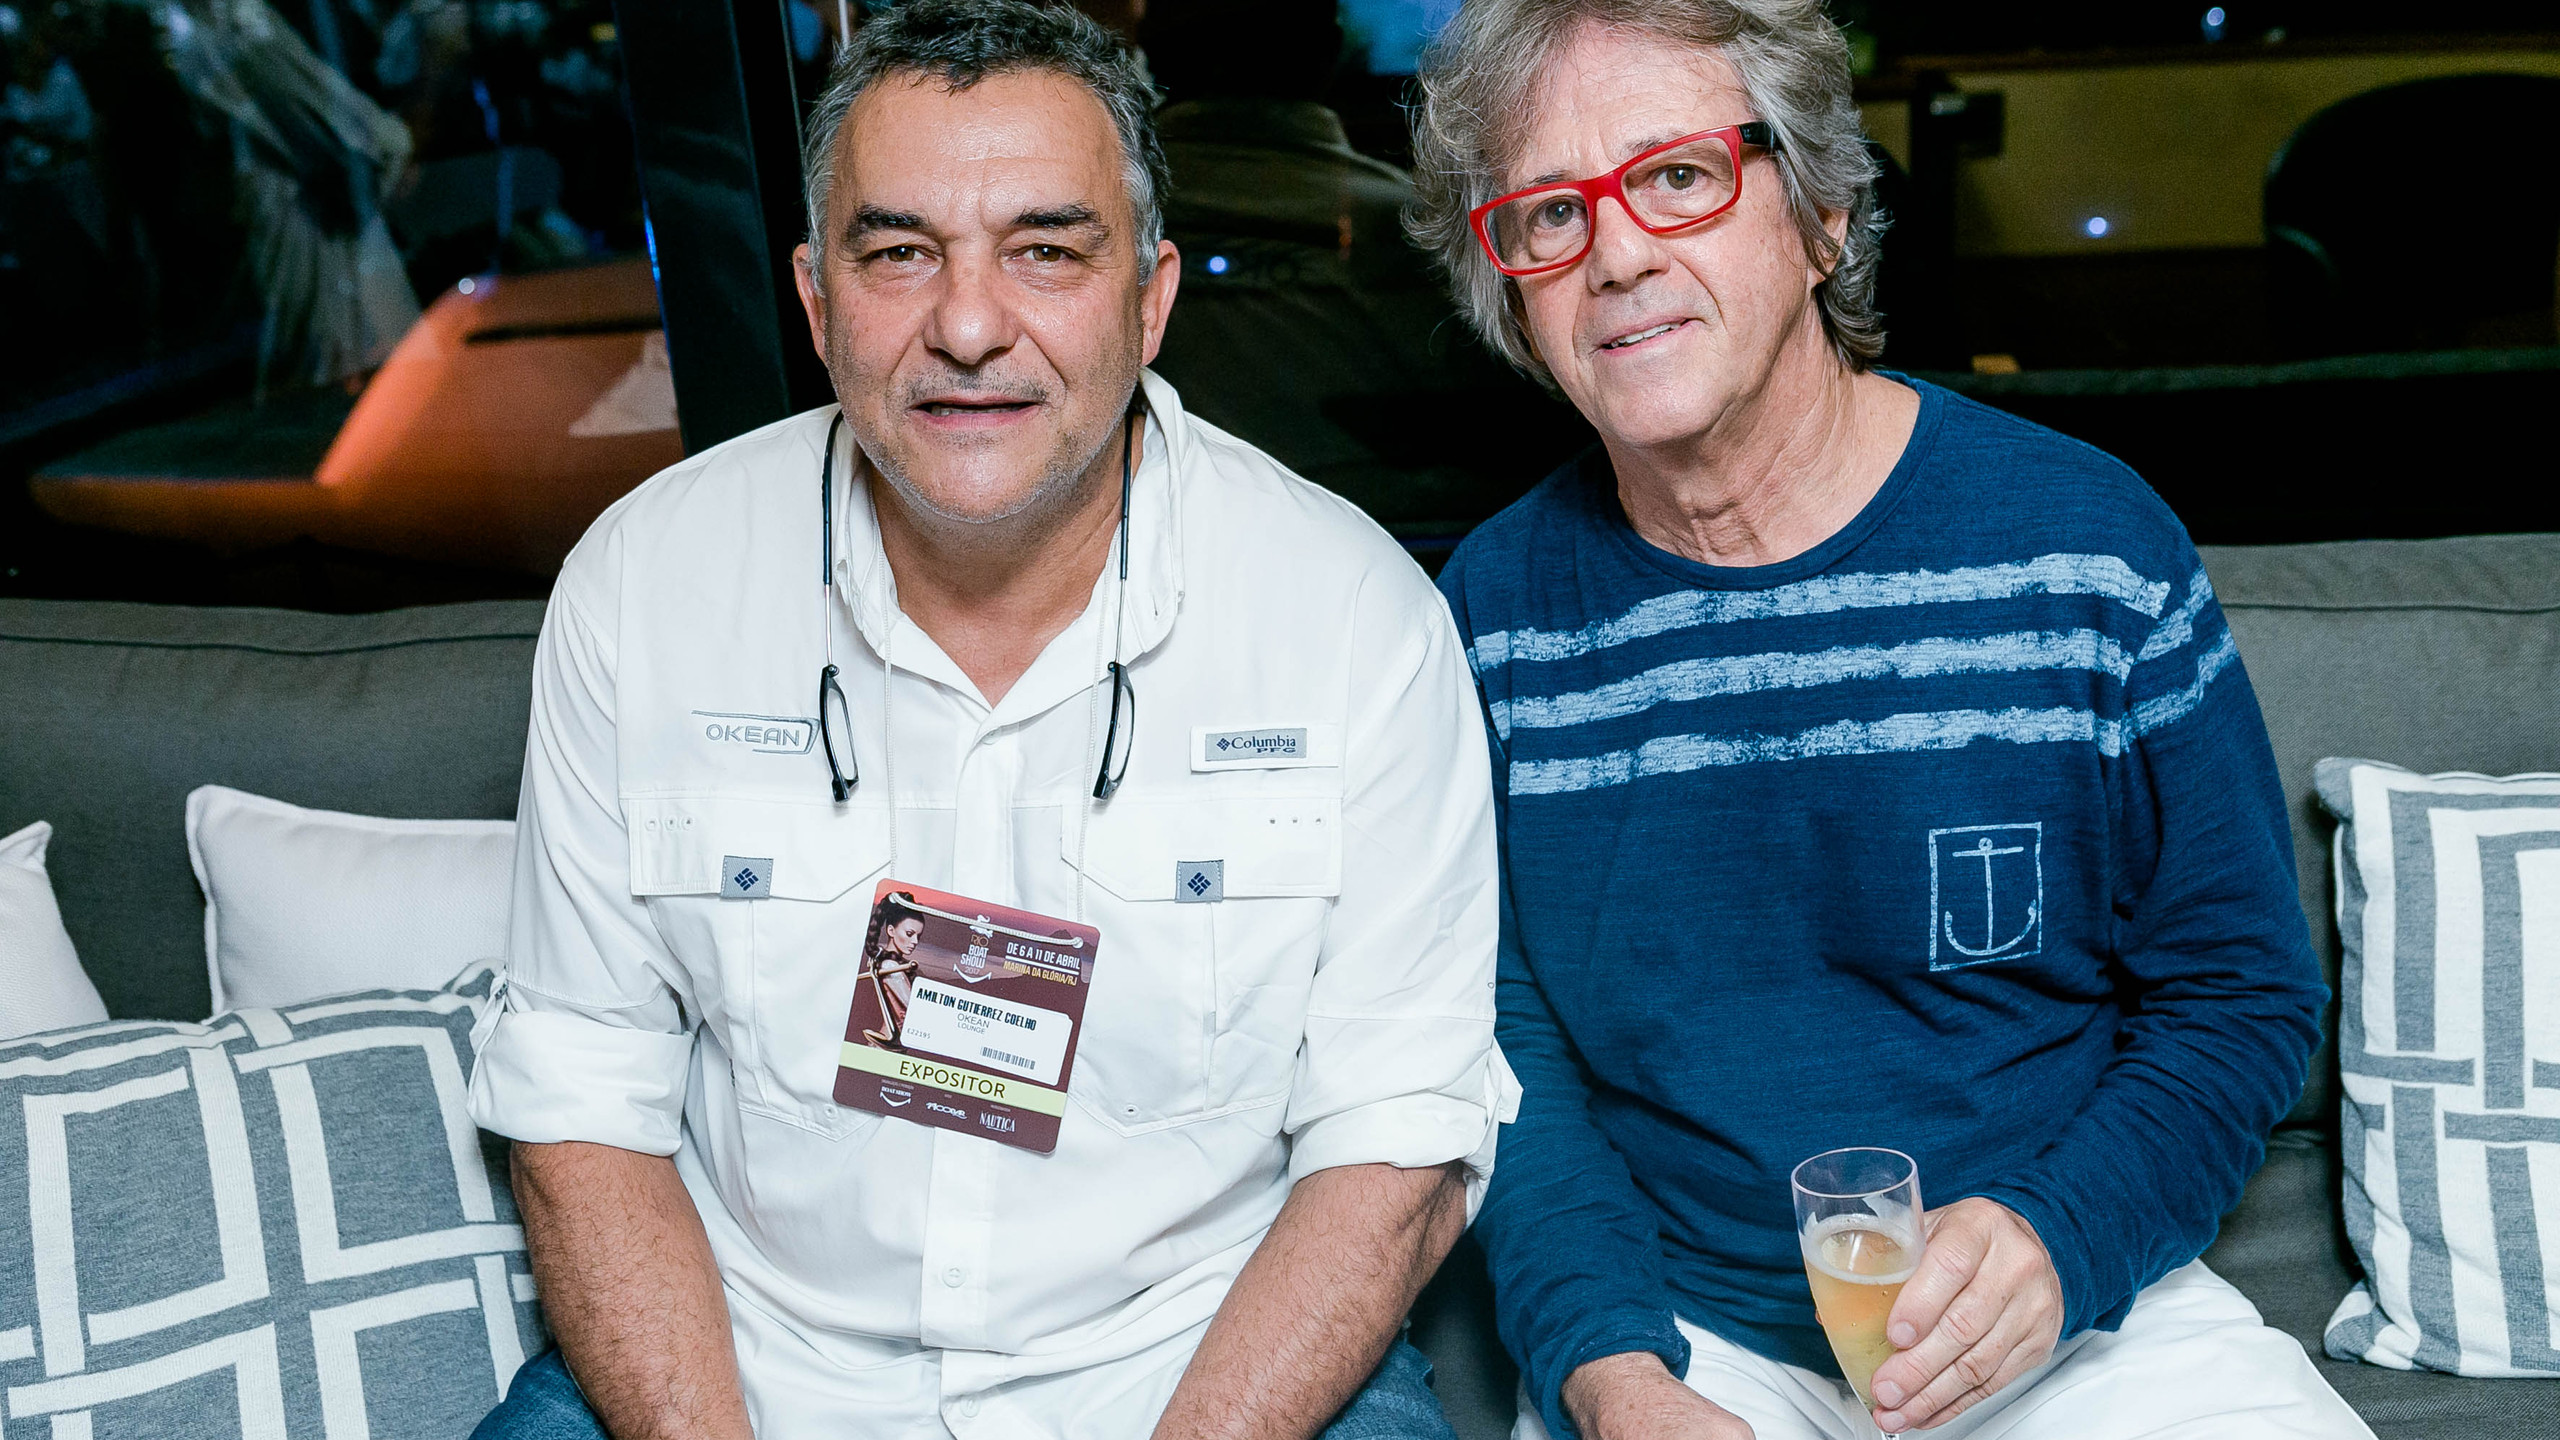 Amilton Gutierrez Coelho e Malagueta-0160